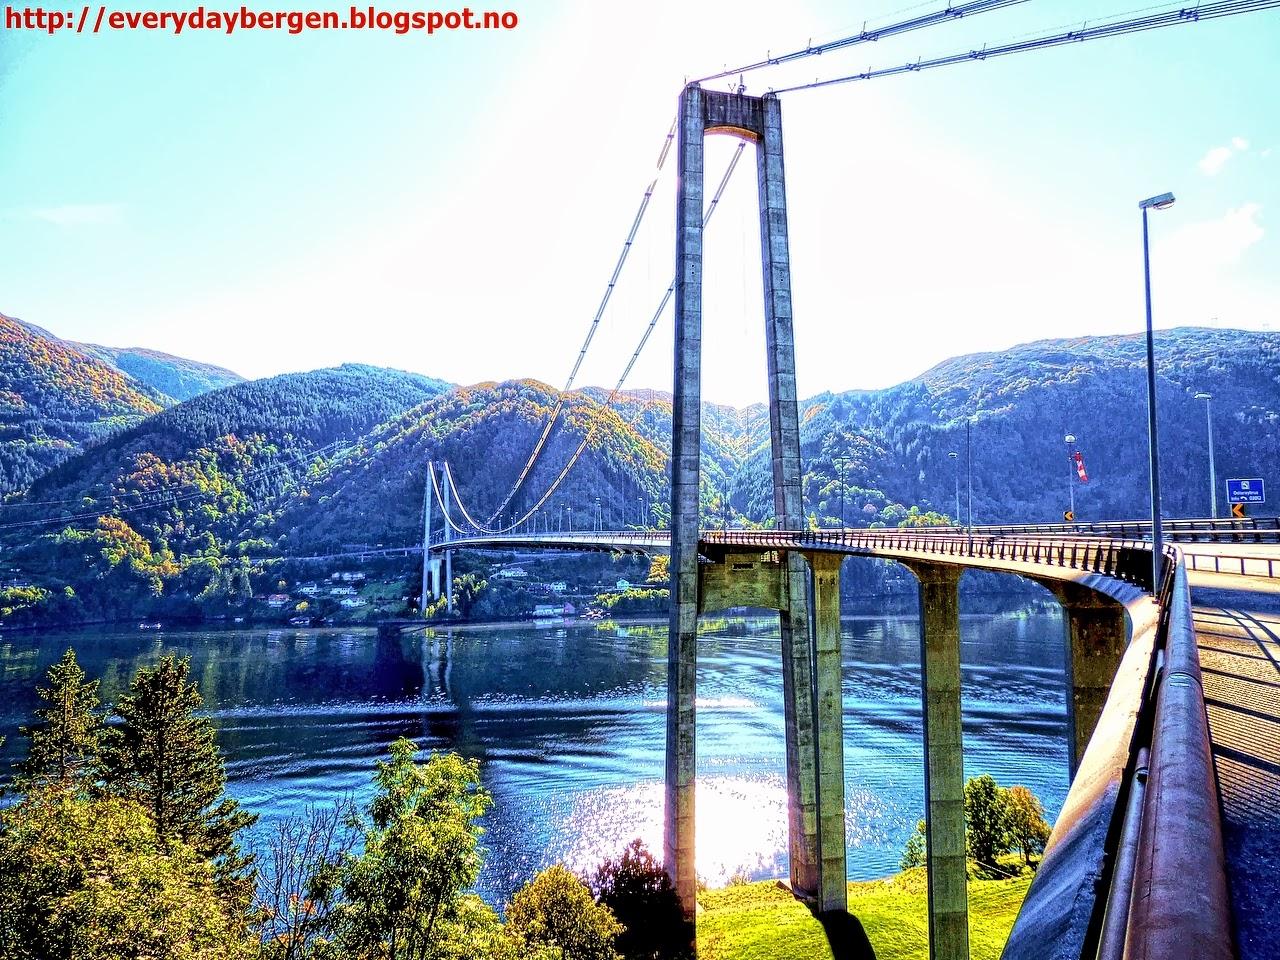 Osterøy Bridge In Hdr